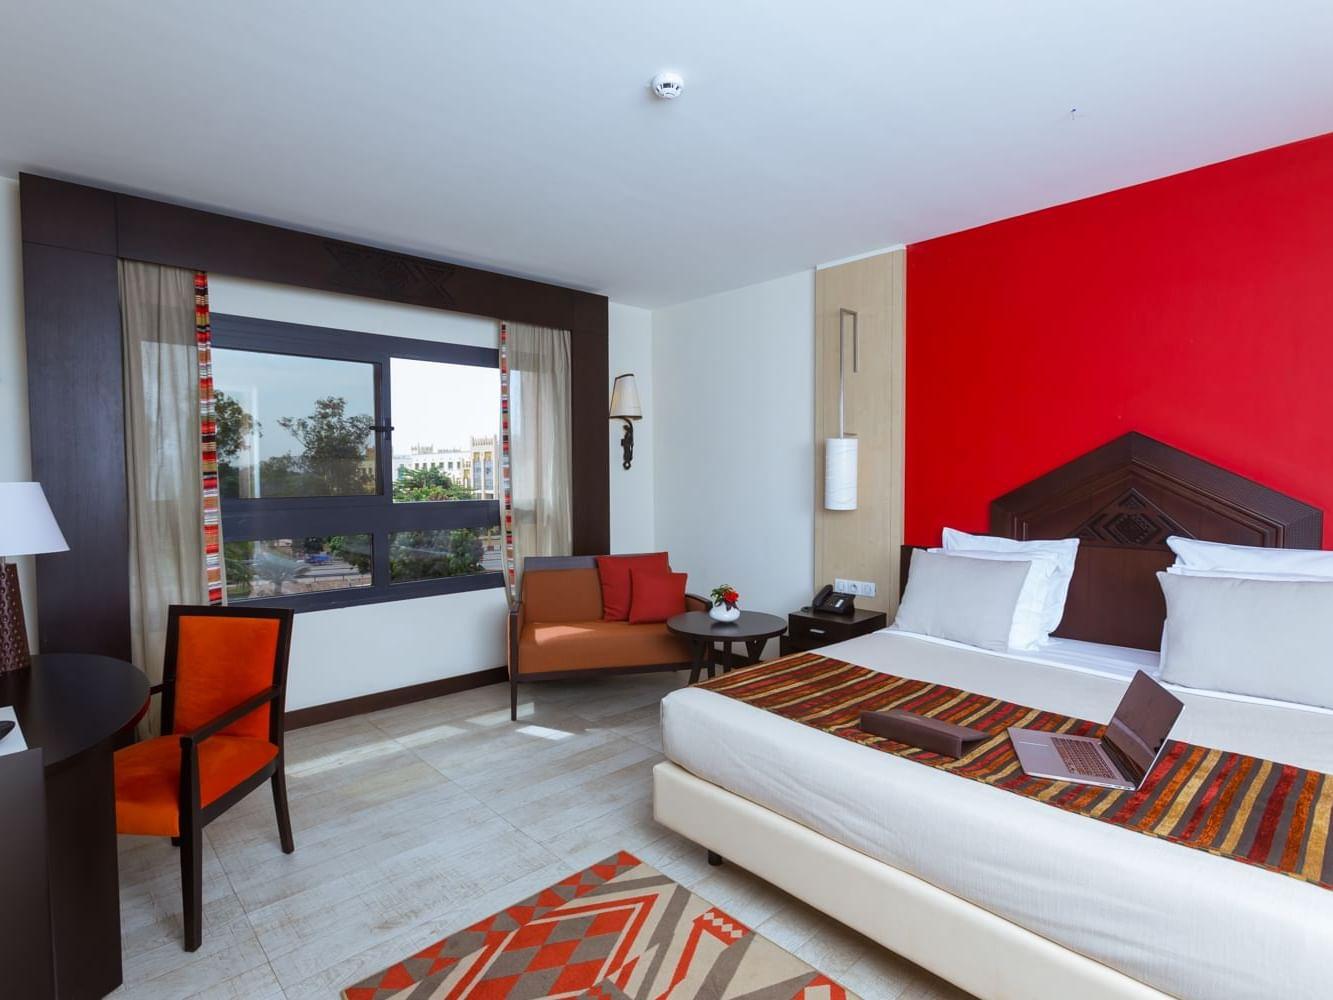 Superior room in Azalai hotel with a big window